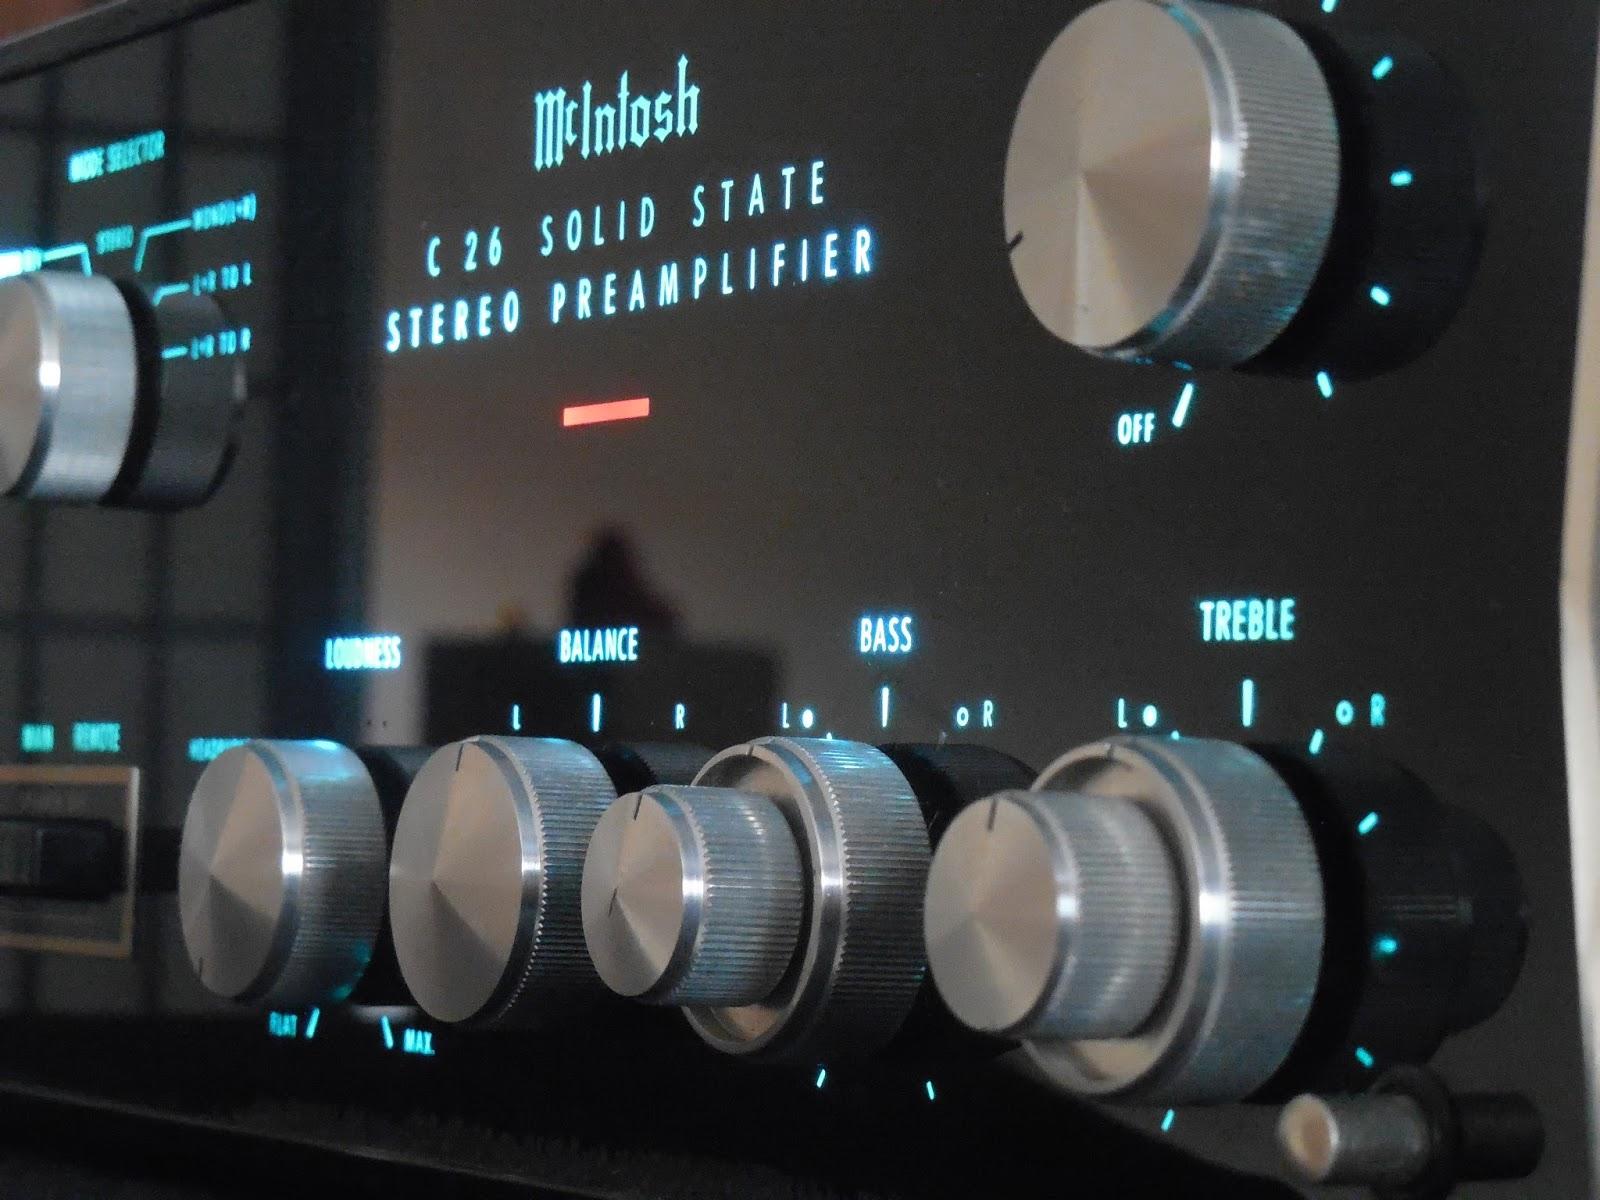 Vintage Hi-Fi Audio Restorations: McIntosh C26 Pre-Amplifier